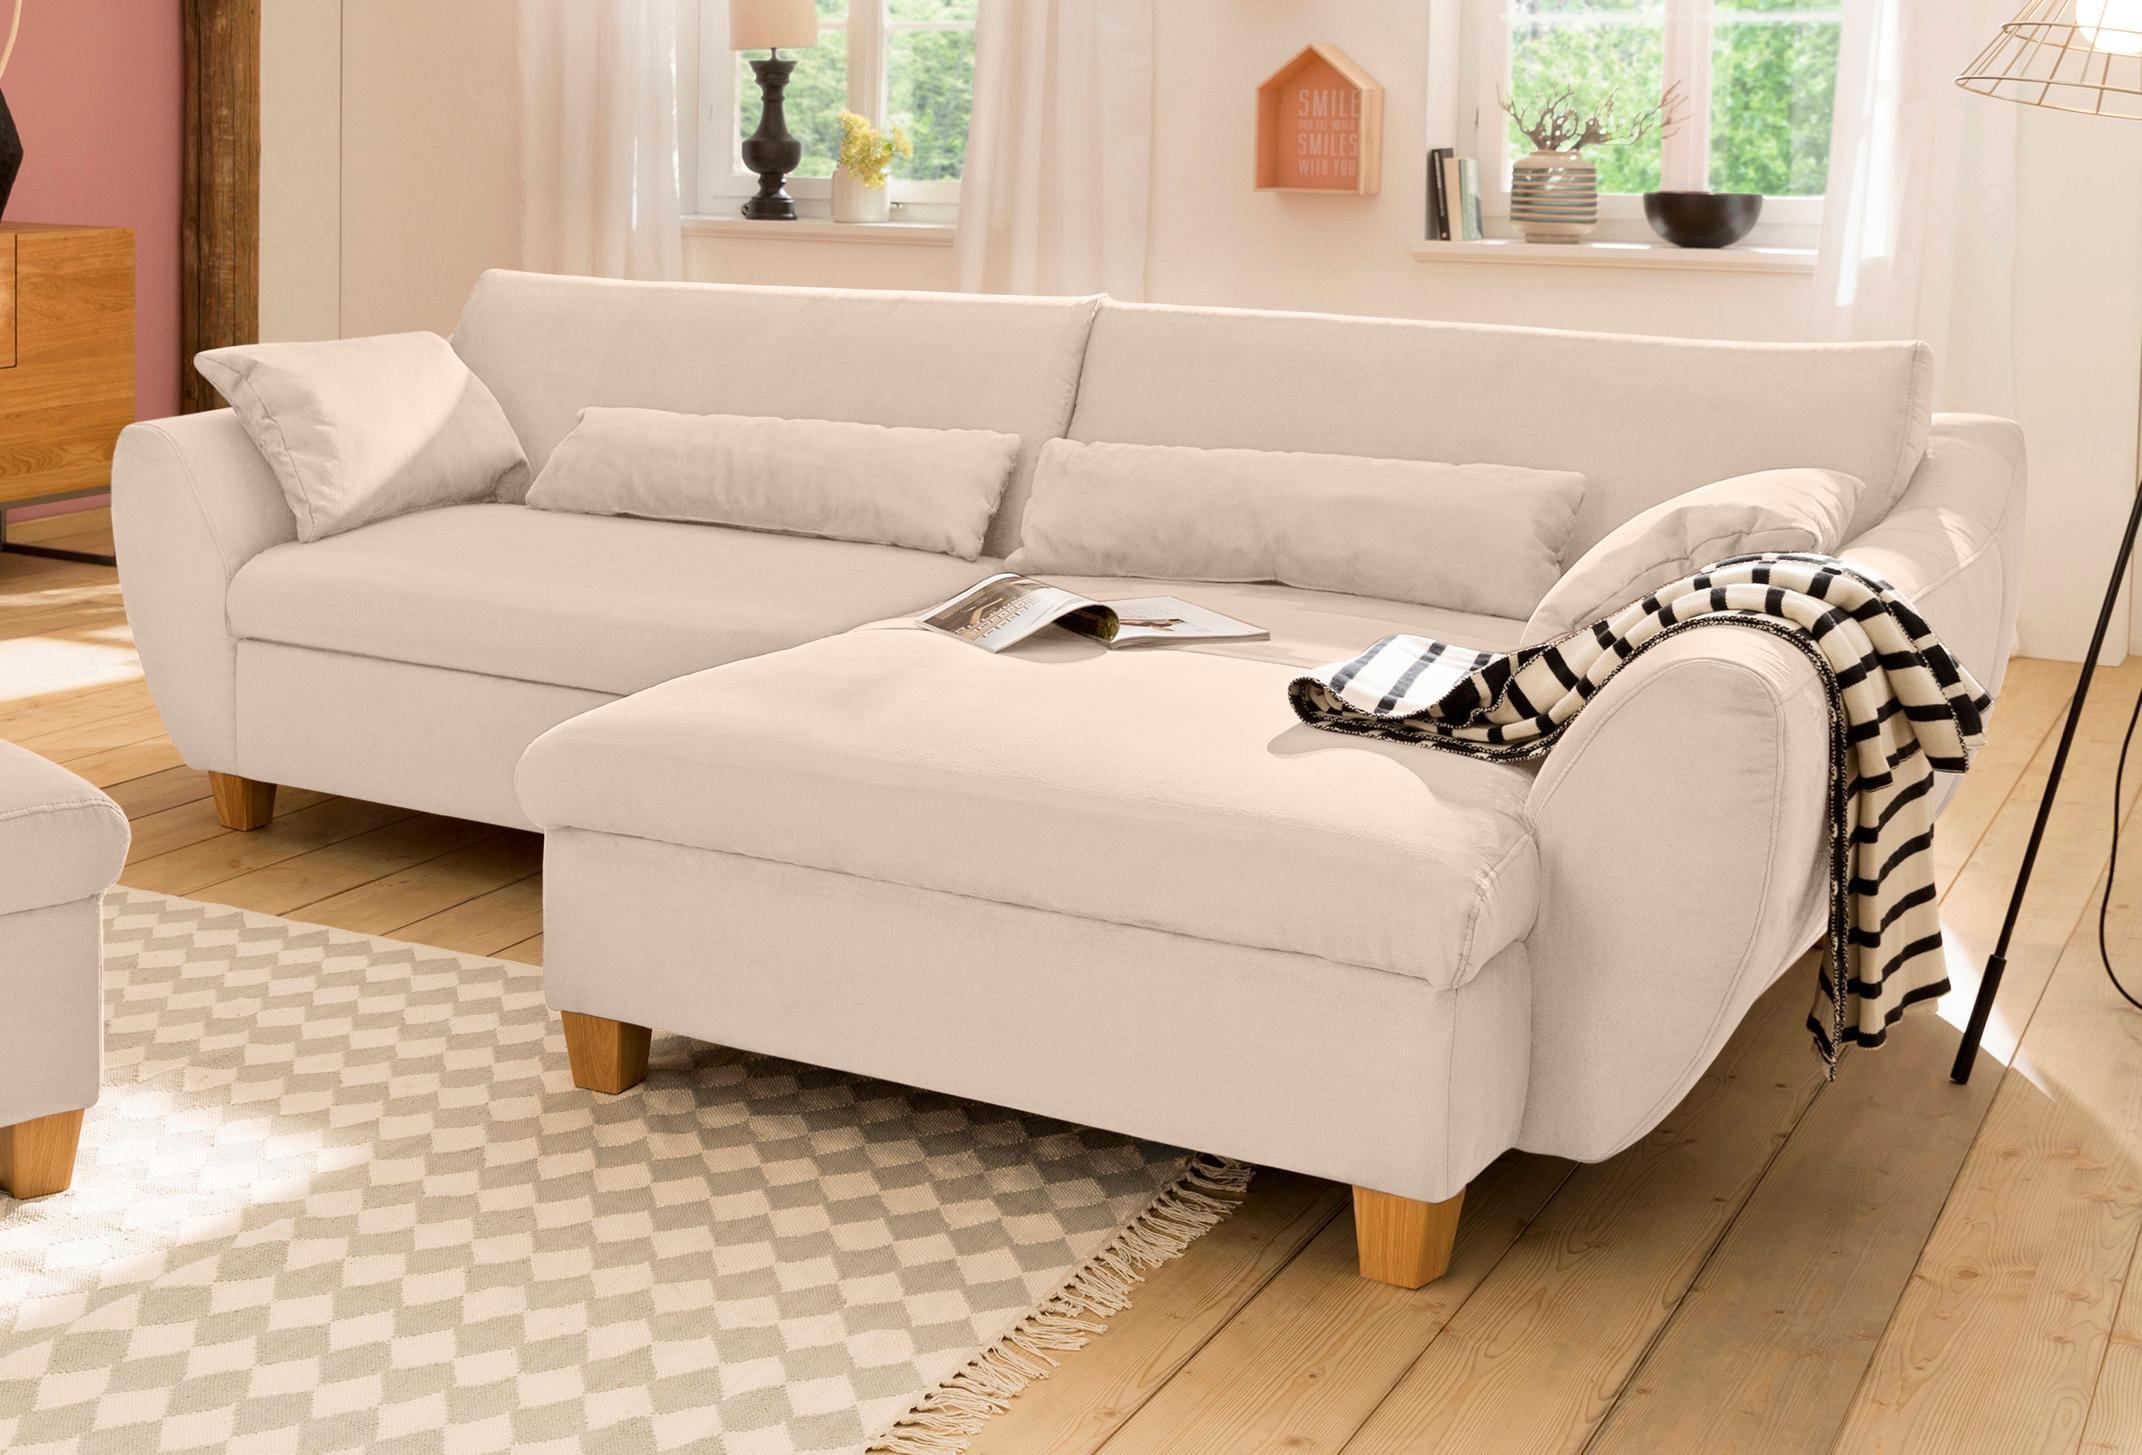 Home Affaire Ecksofa Becca Online Kaufen Quelle Ch